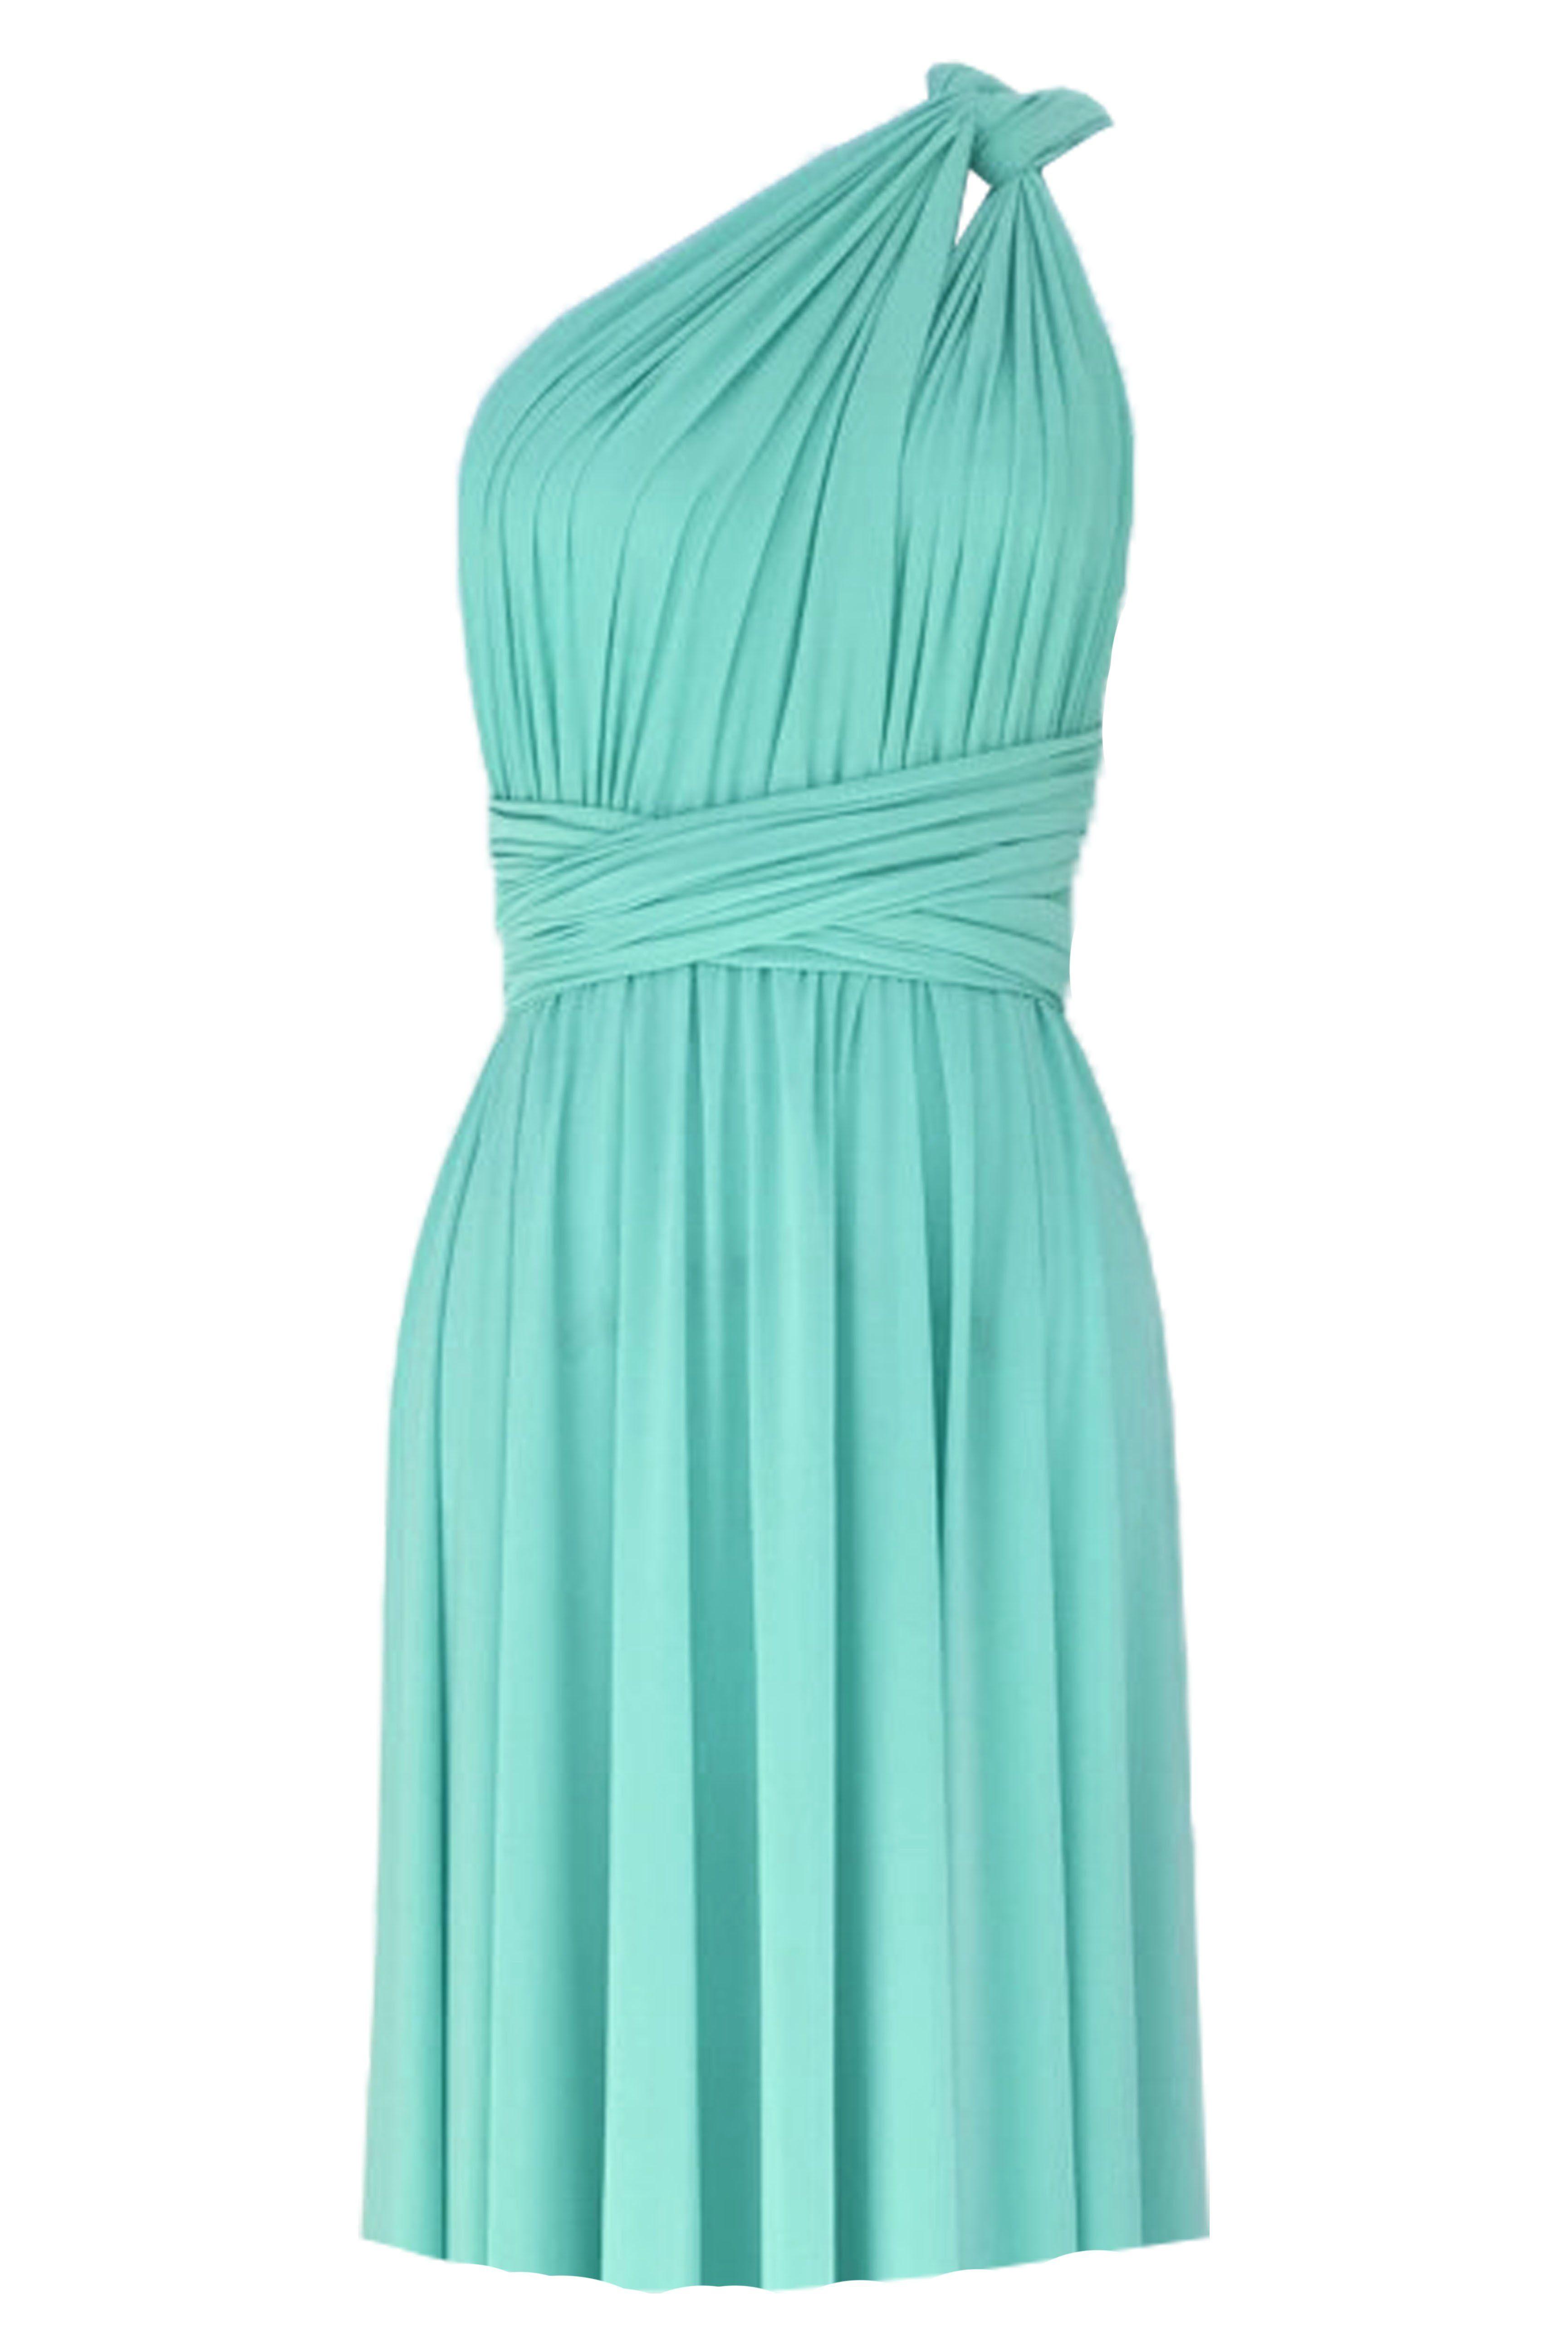 94fda24b7369 Convertible bridesmaids dress Tiffany blue infinity knee length dress Plus  size prom evening formal dress XS S M L XL 0XL 1XL 2XL 3XL 4XL 5XL  meta ...